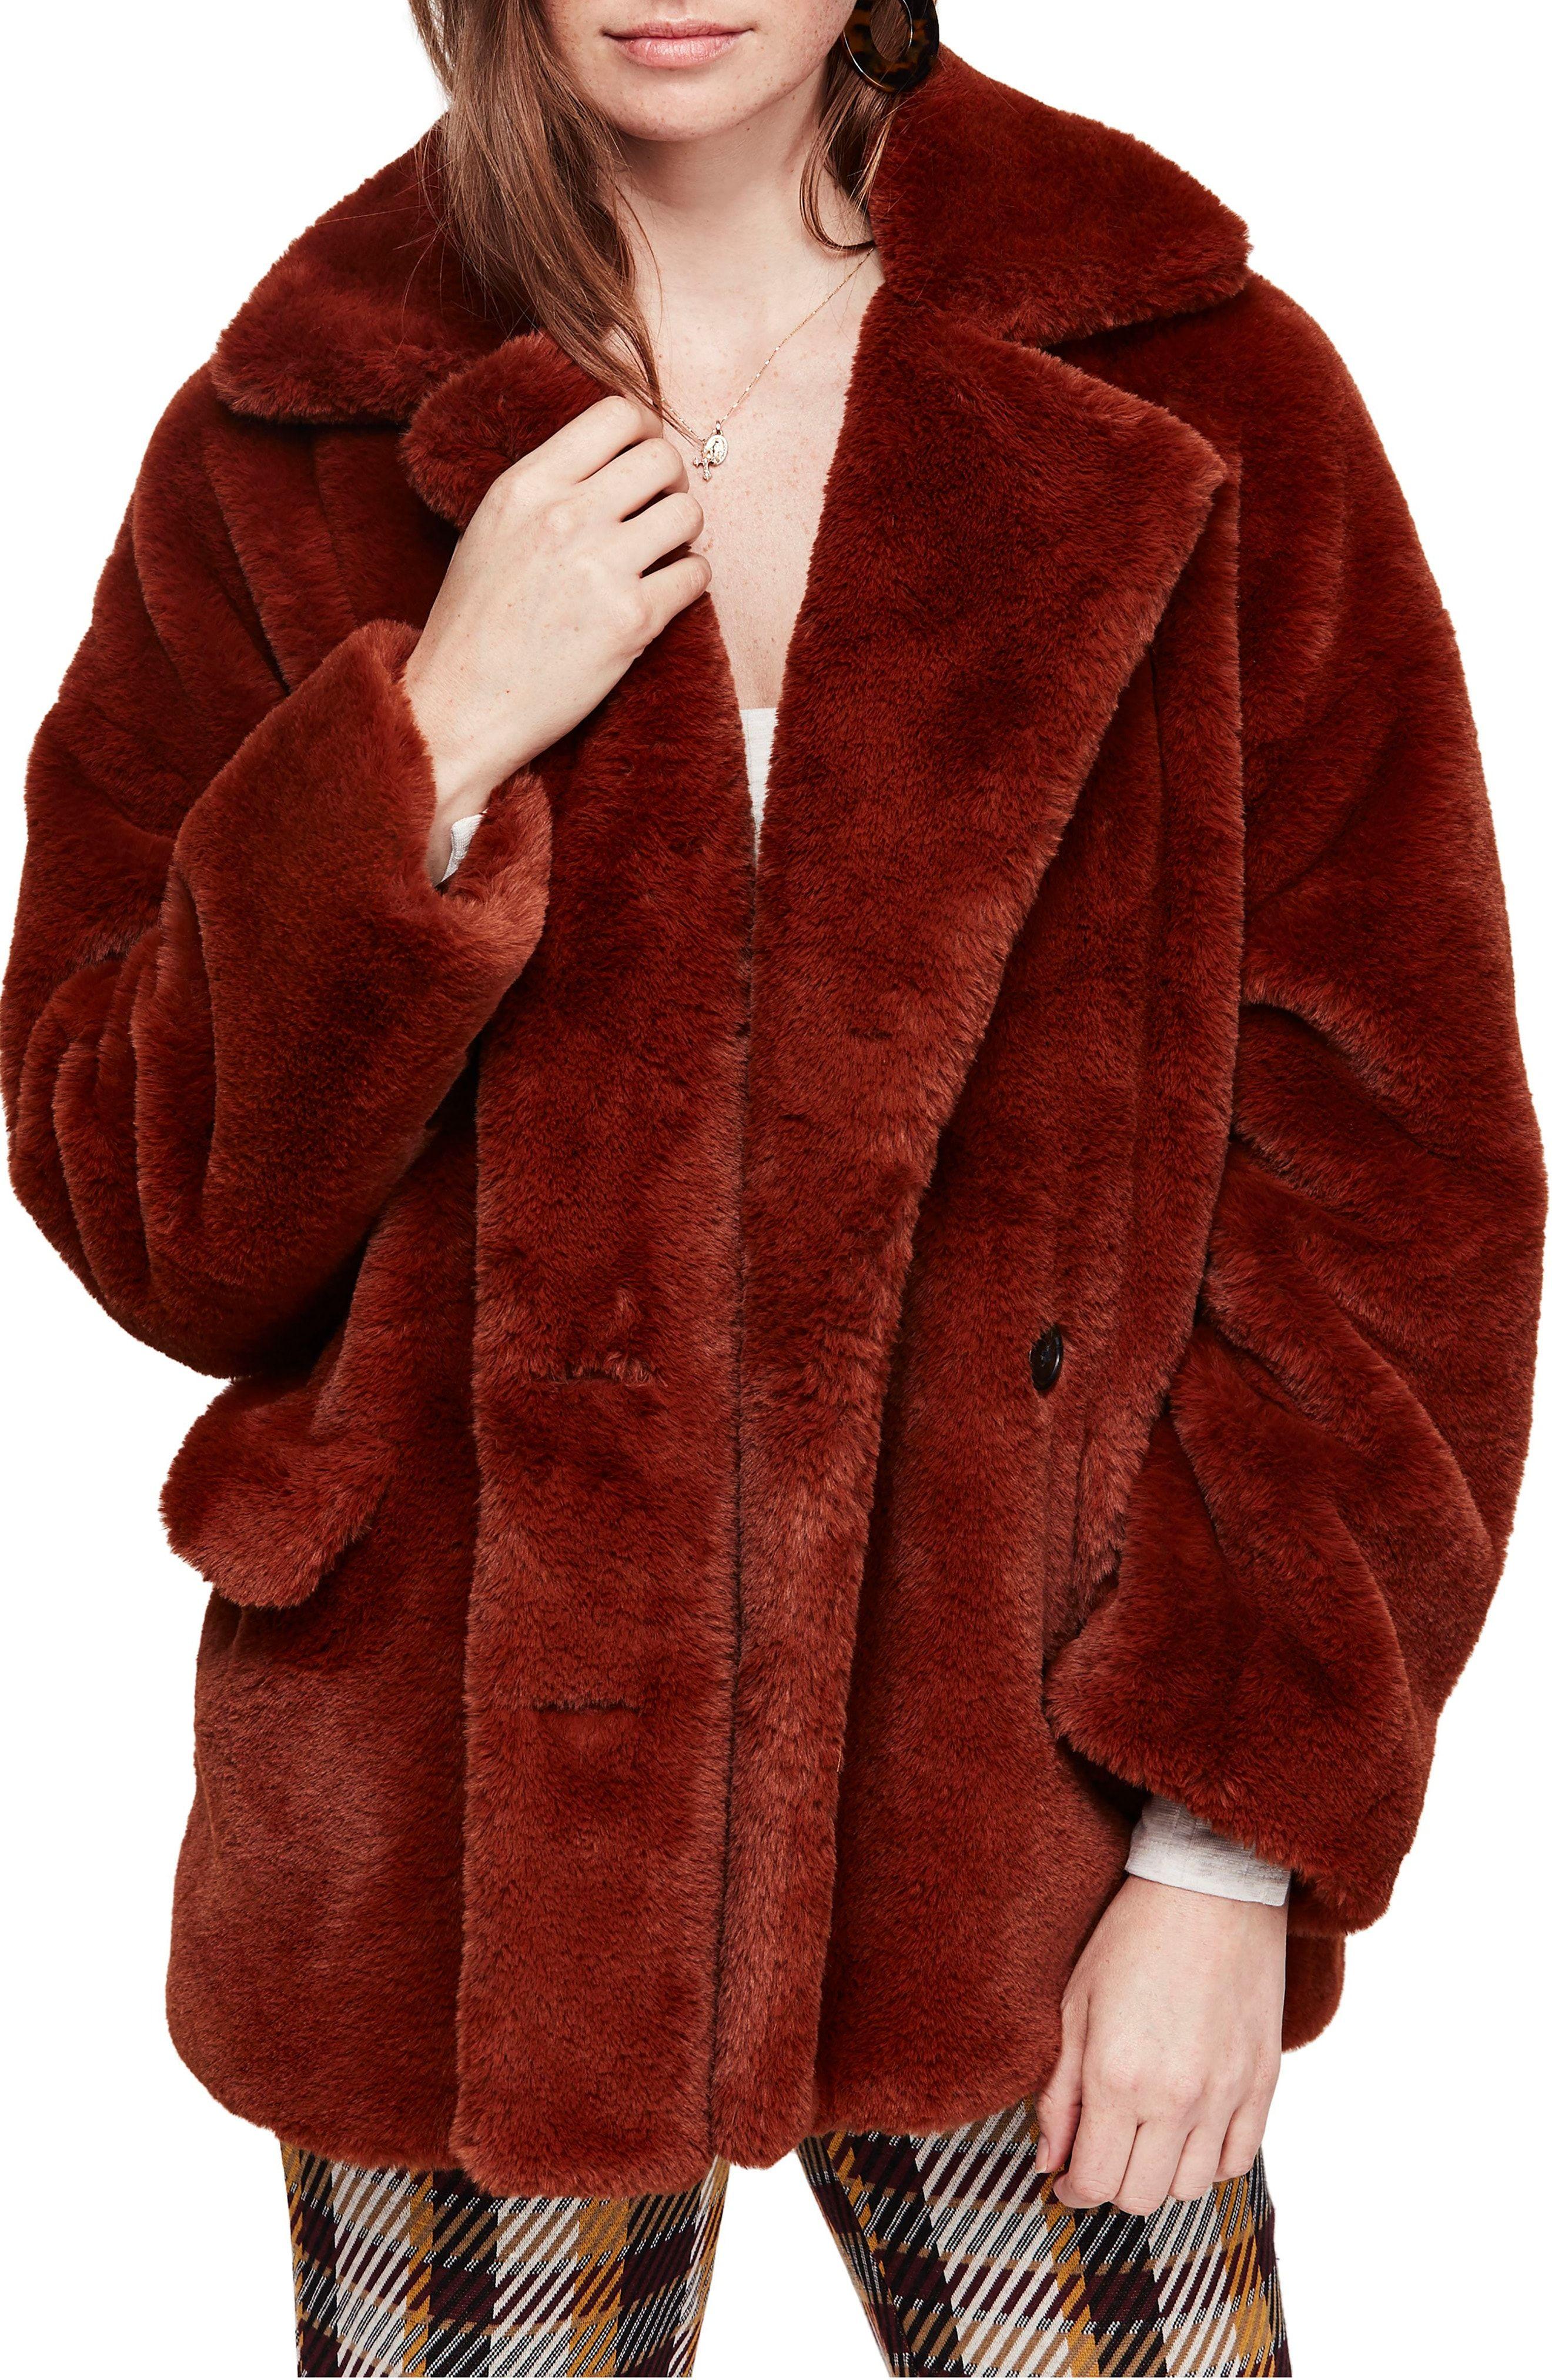 e55ad0f422 22 Best Winter Coats for 2019 - Elegant Long Winter Jackets for Women